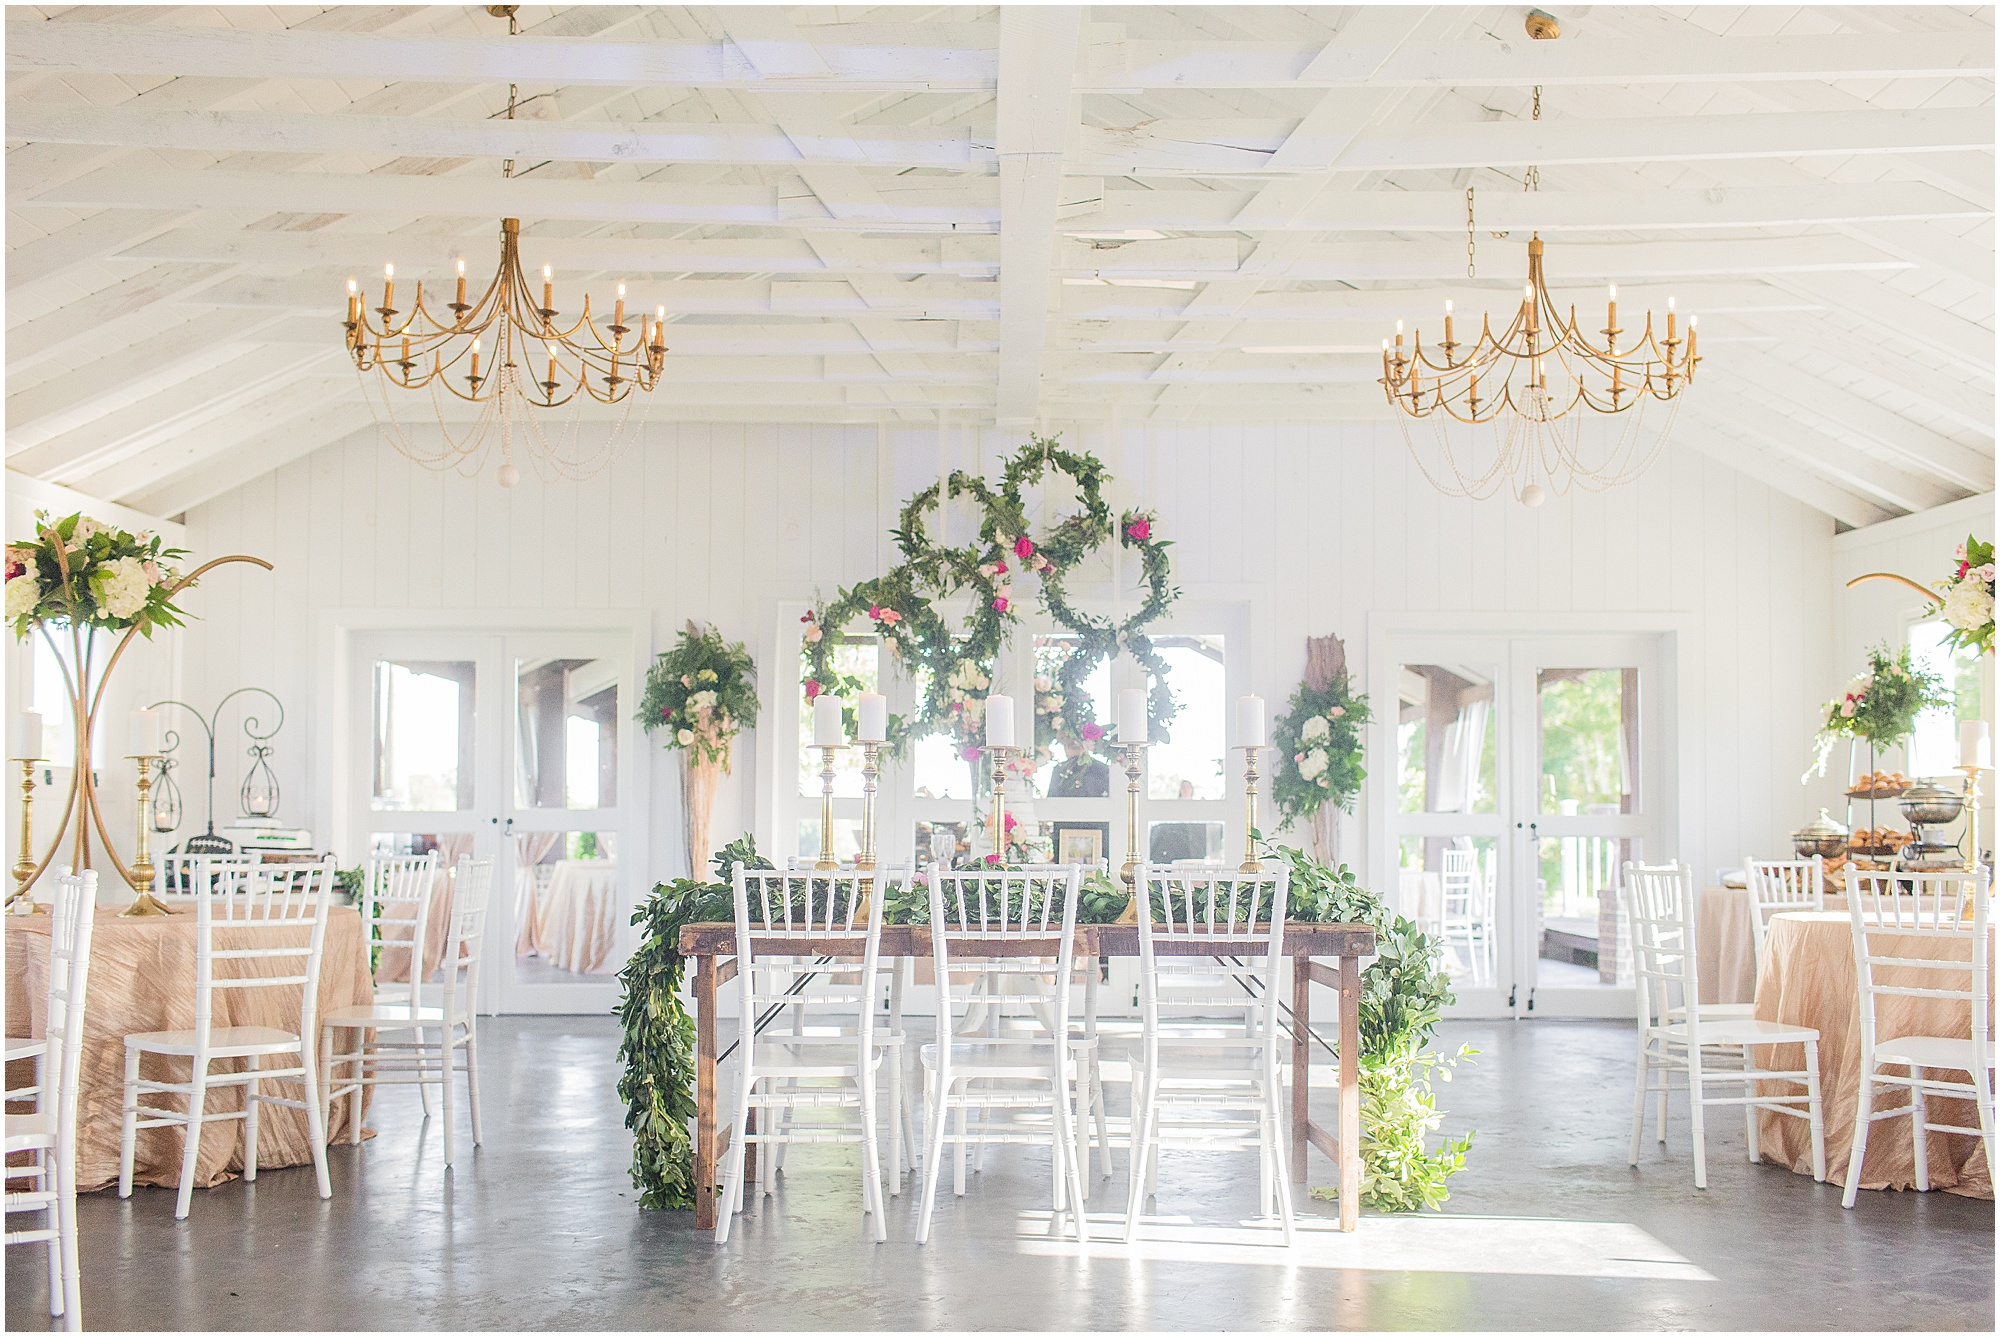 starkville-mississippi-wedding-page-place-dodson-farms_0069.jpg